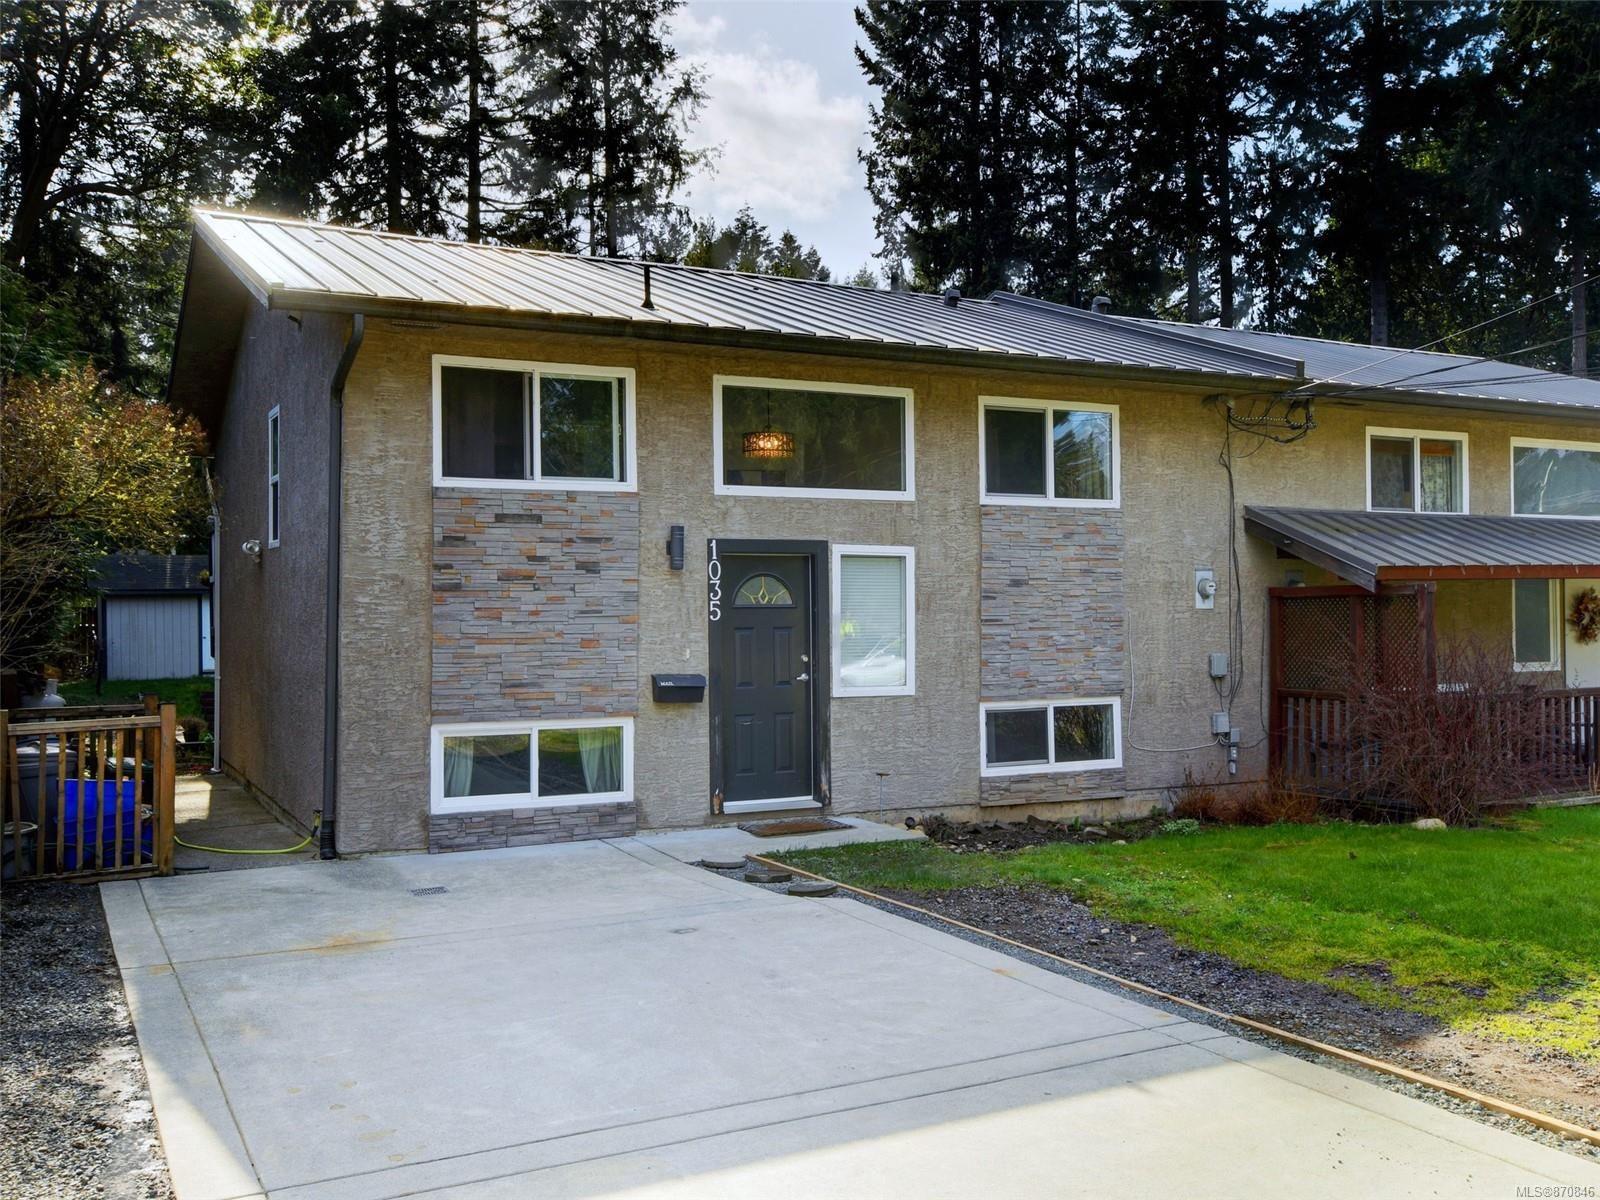 Main Photo: 1035 HASLAM Ave in : La Glen Lake Half Duplex for sale (Langford)  : MLS®# 870846